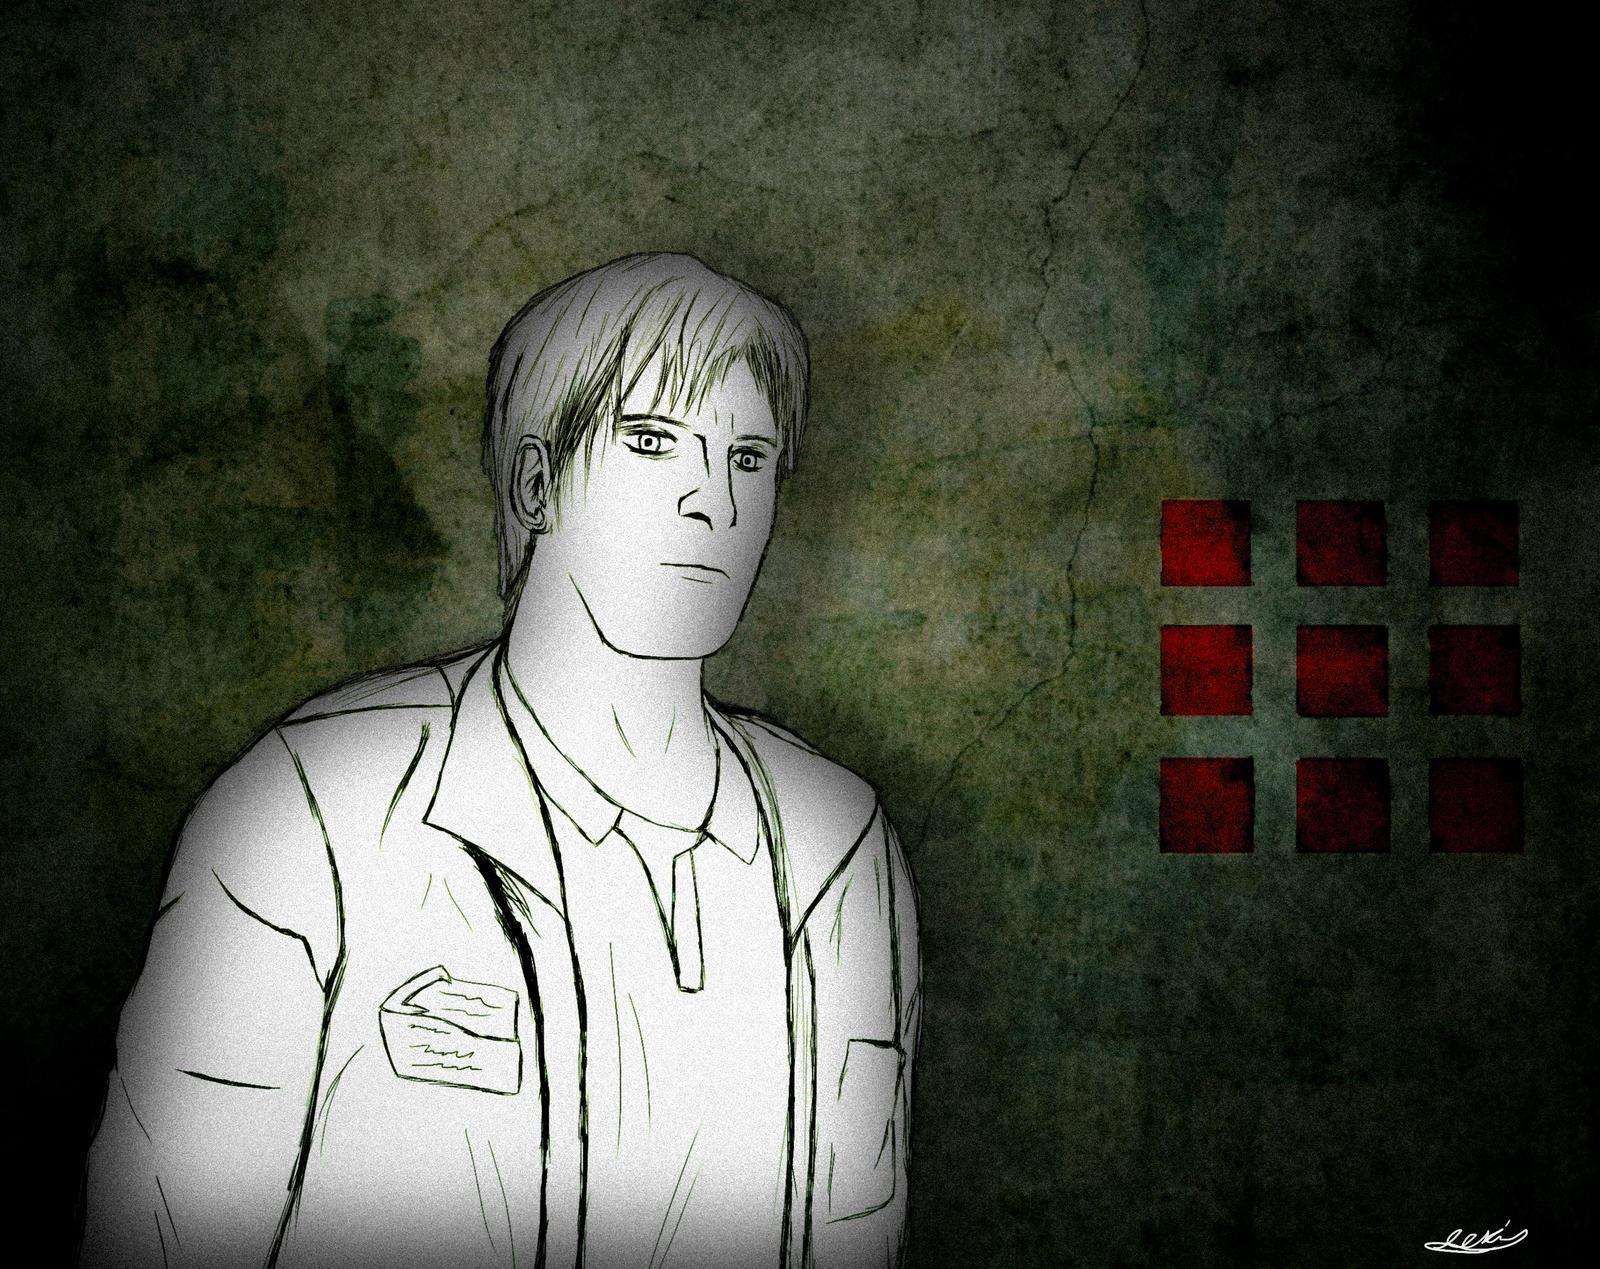 James Sunderland Silent Hill 2 By Apclevi On Deviantart